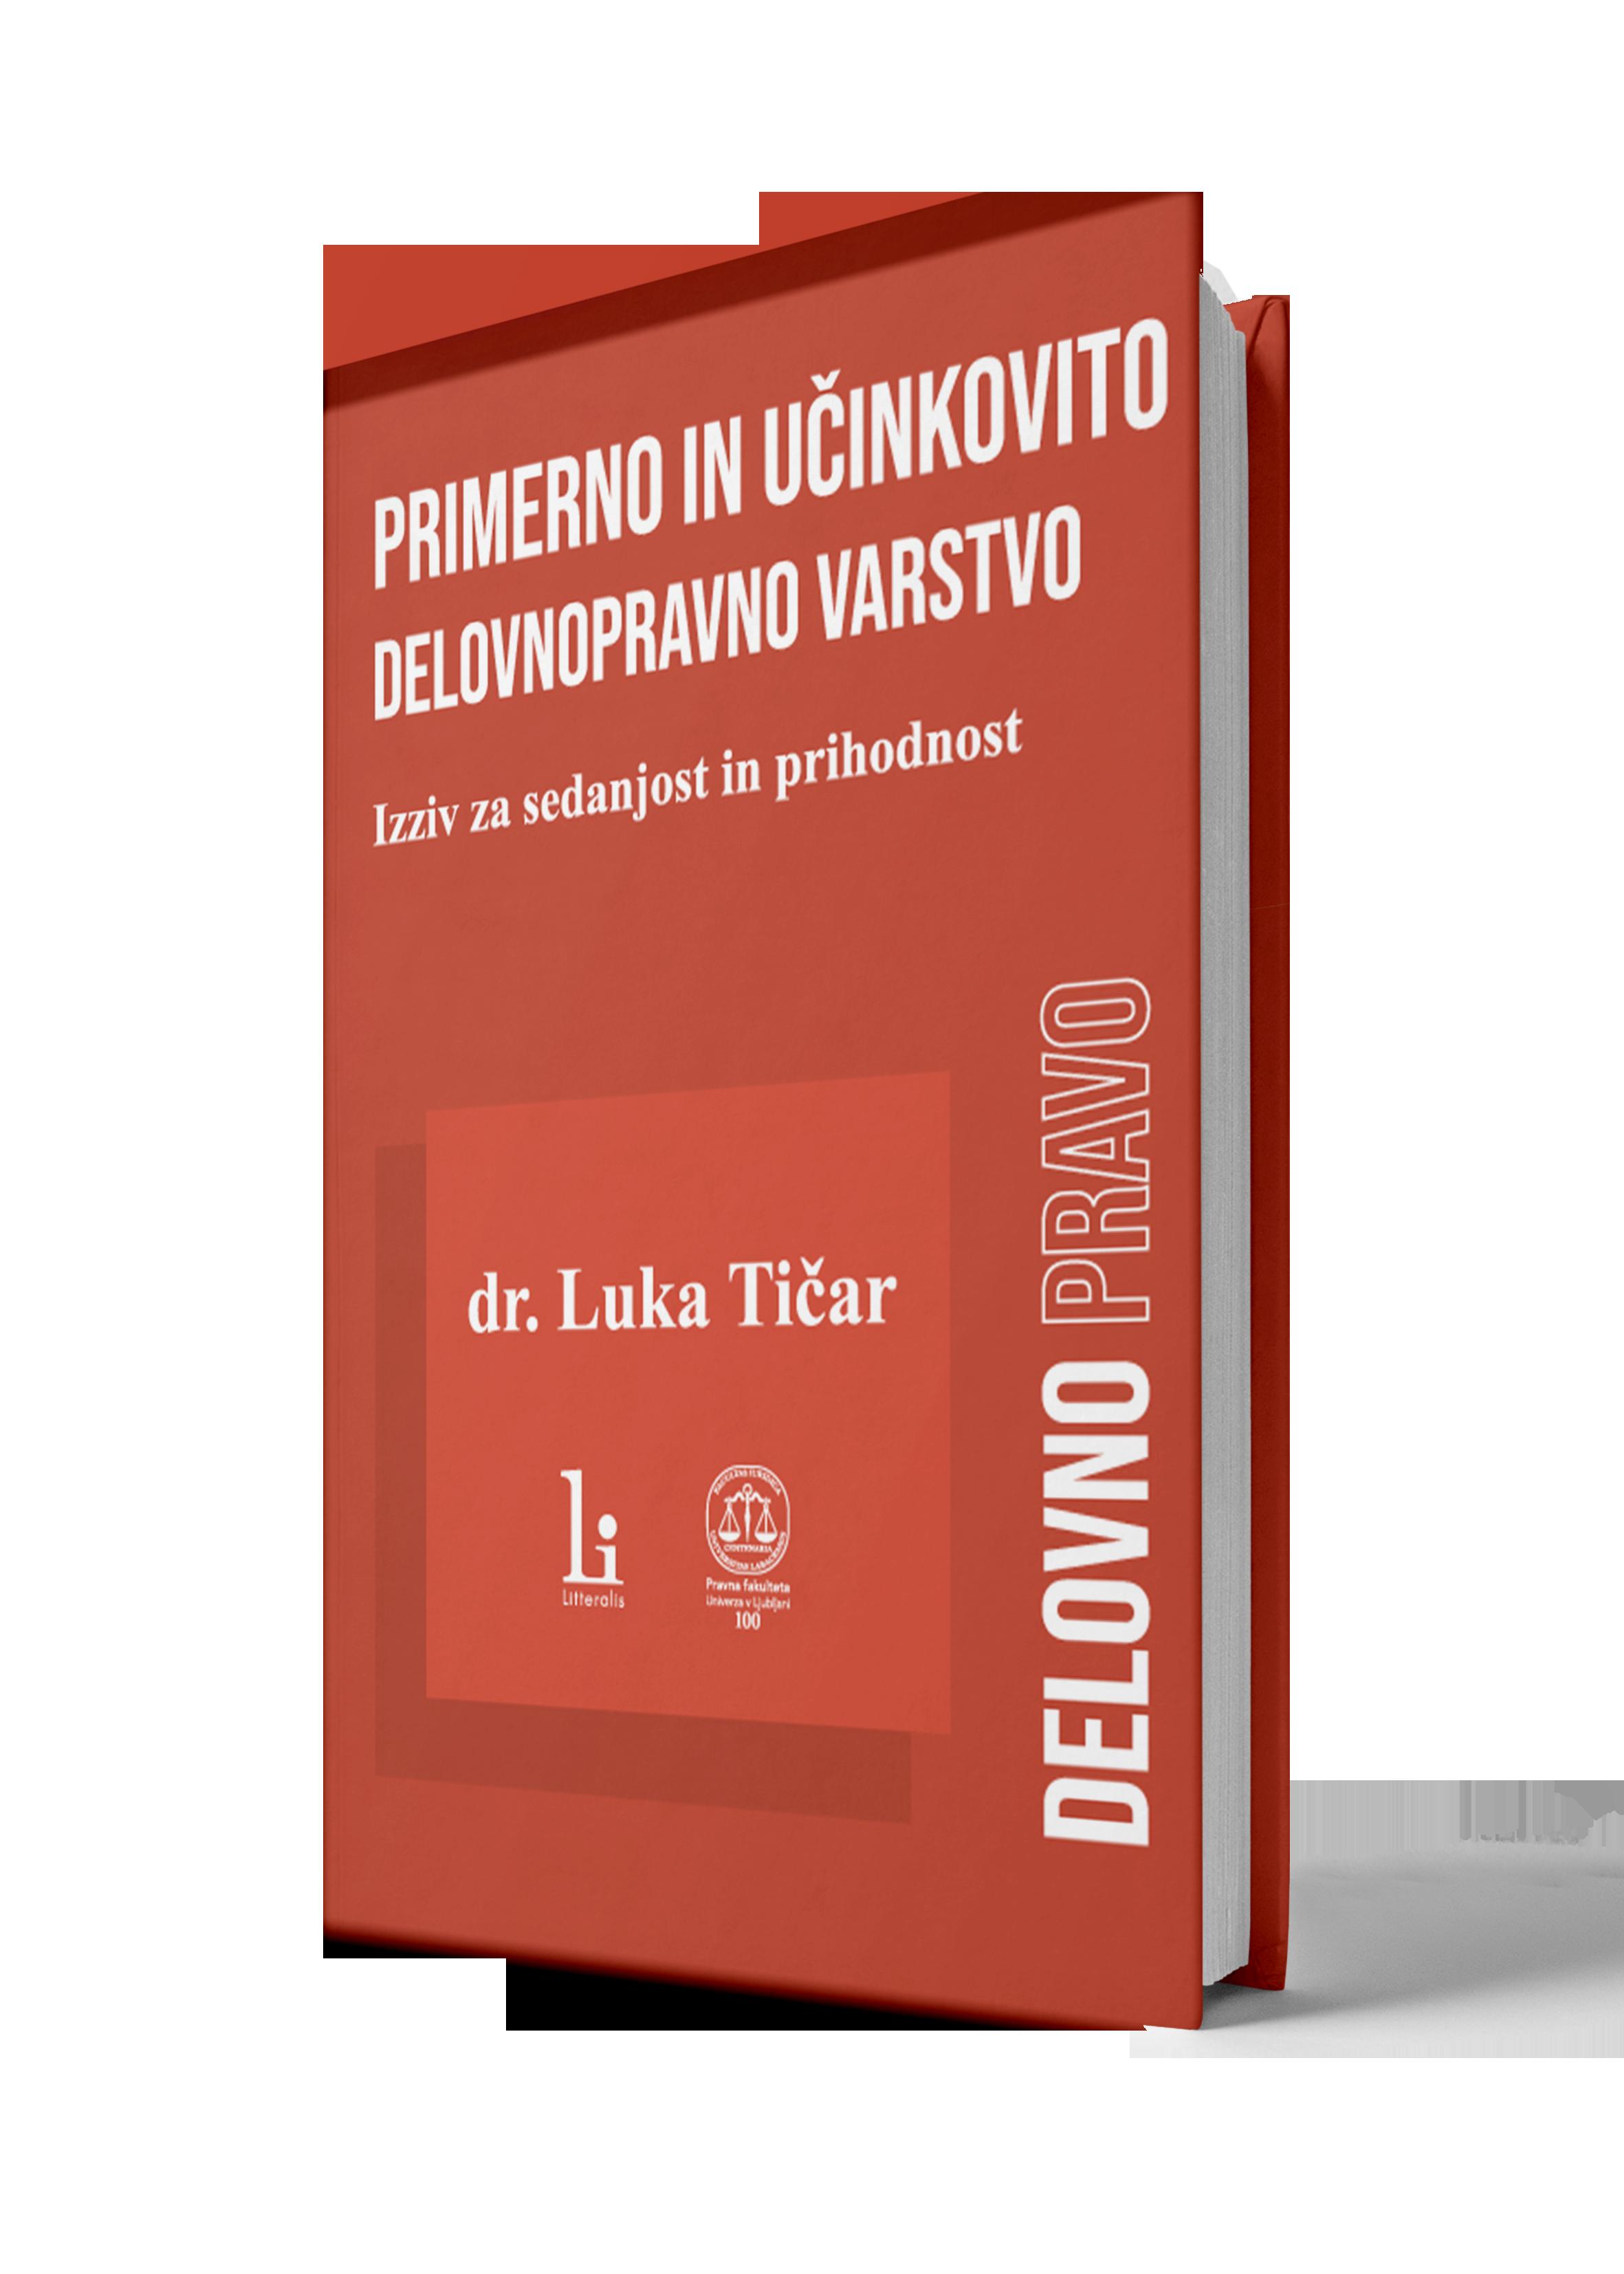 luka_ticar